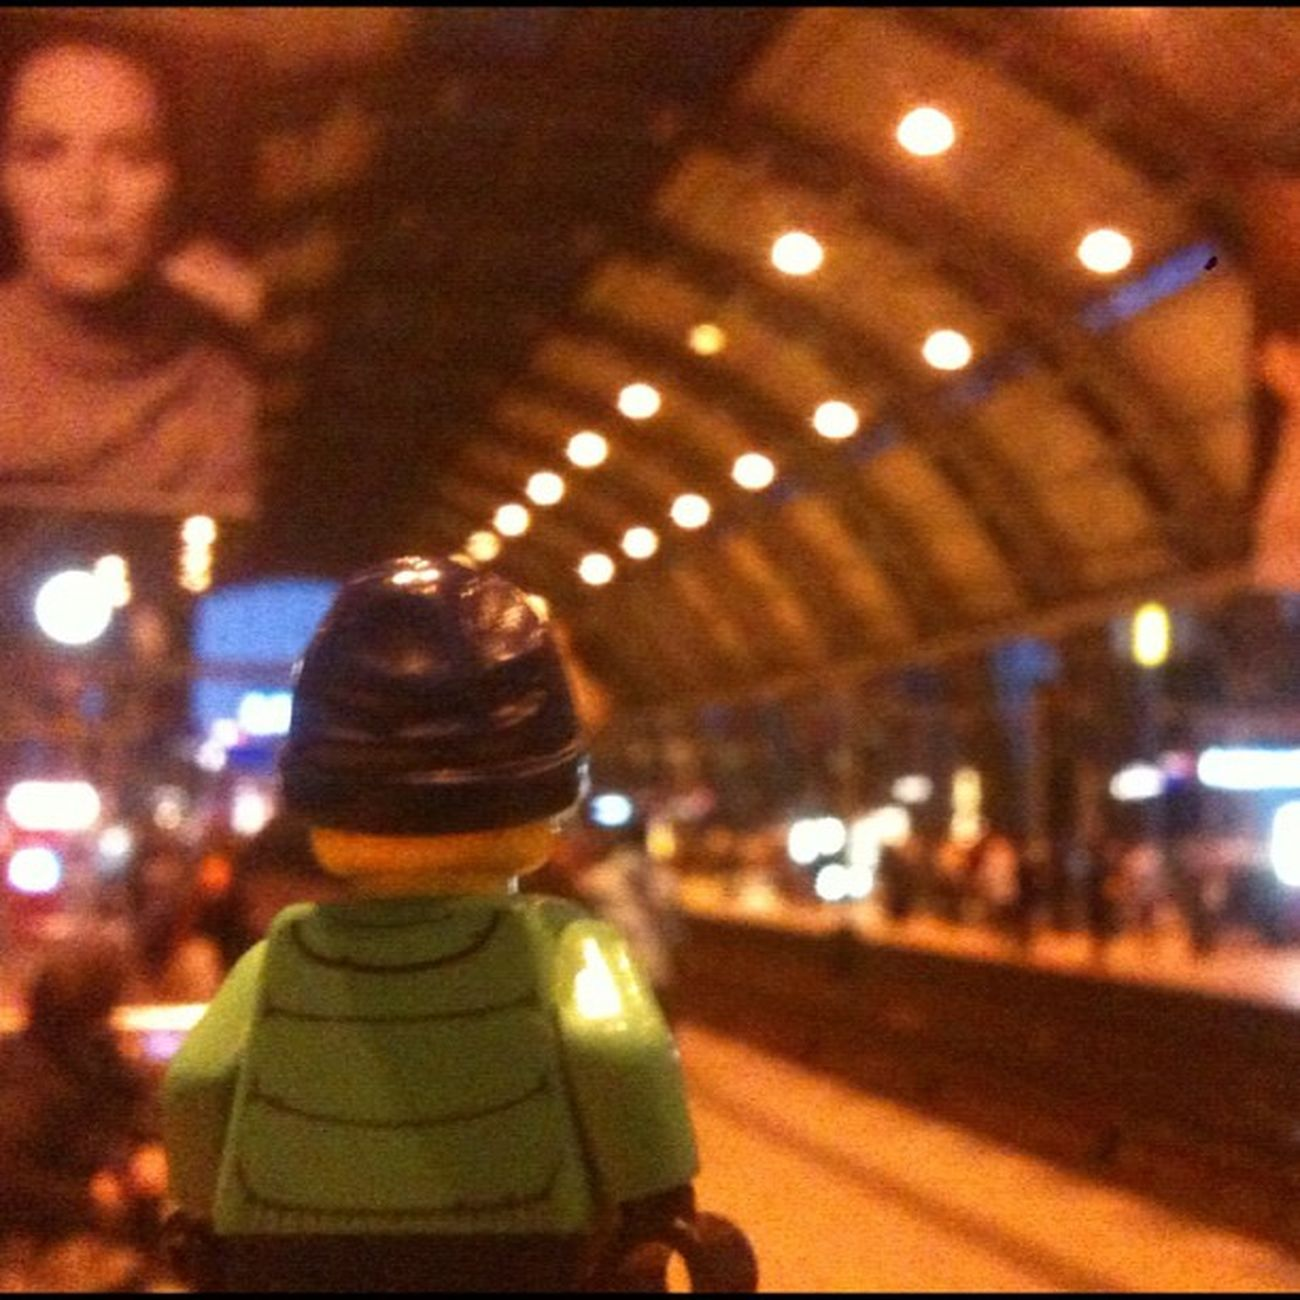 Bahnhof Alexanderplatz, ESPRIT Berlin Alexanderplatz Travel Berlintourist LEGO Trainstation Esprit Fashion Model